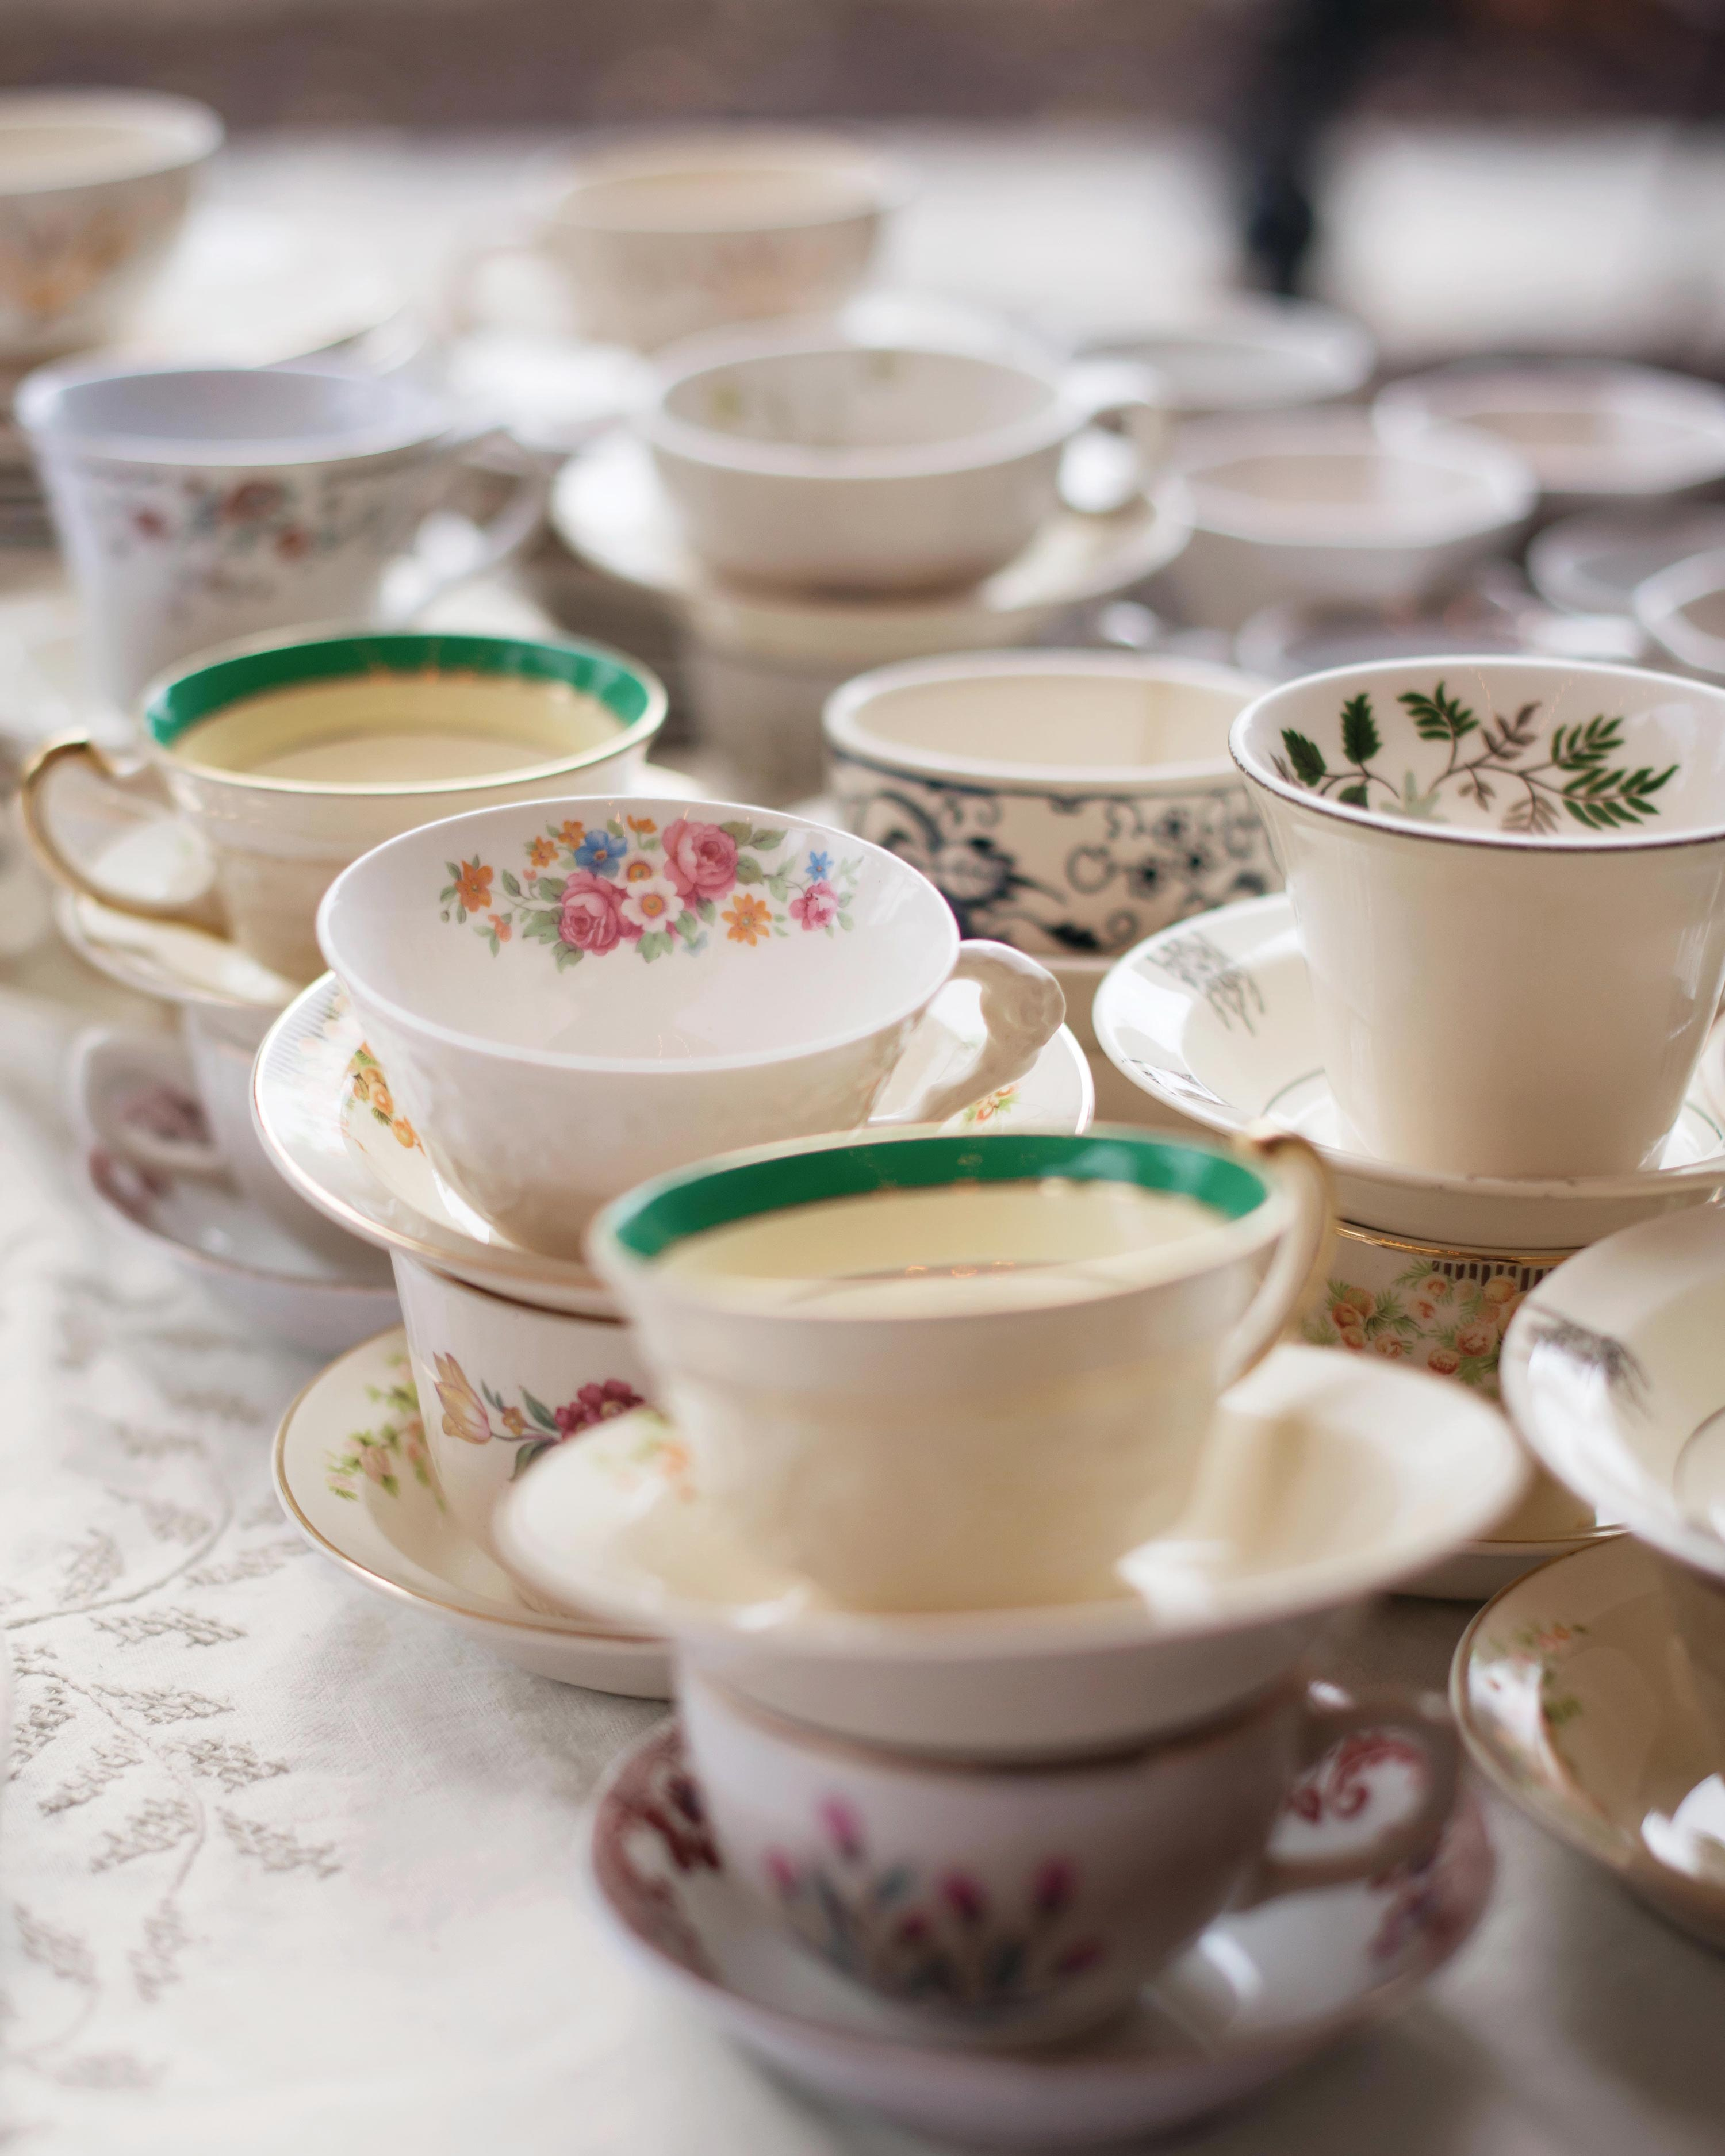 stephanie-mike-wedding-north-carolina-coffee-vintage-teacups-saucers-324-s112980.jpg